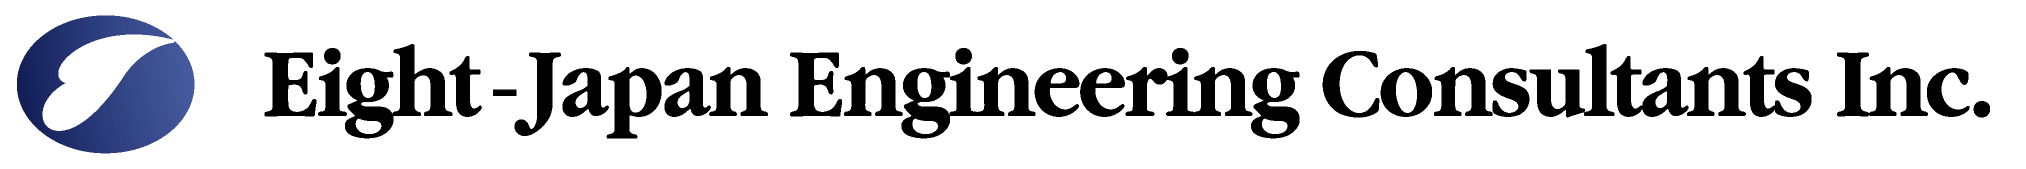 ej engineering group inc